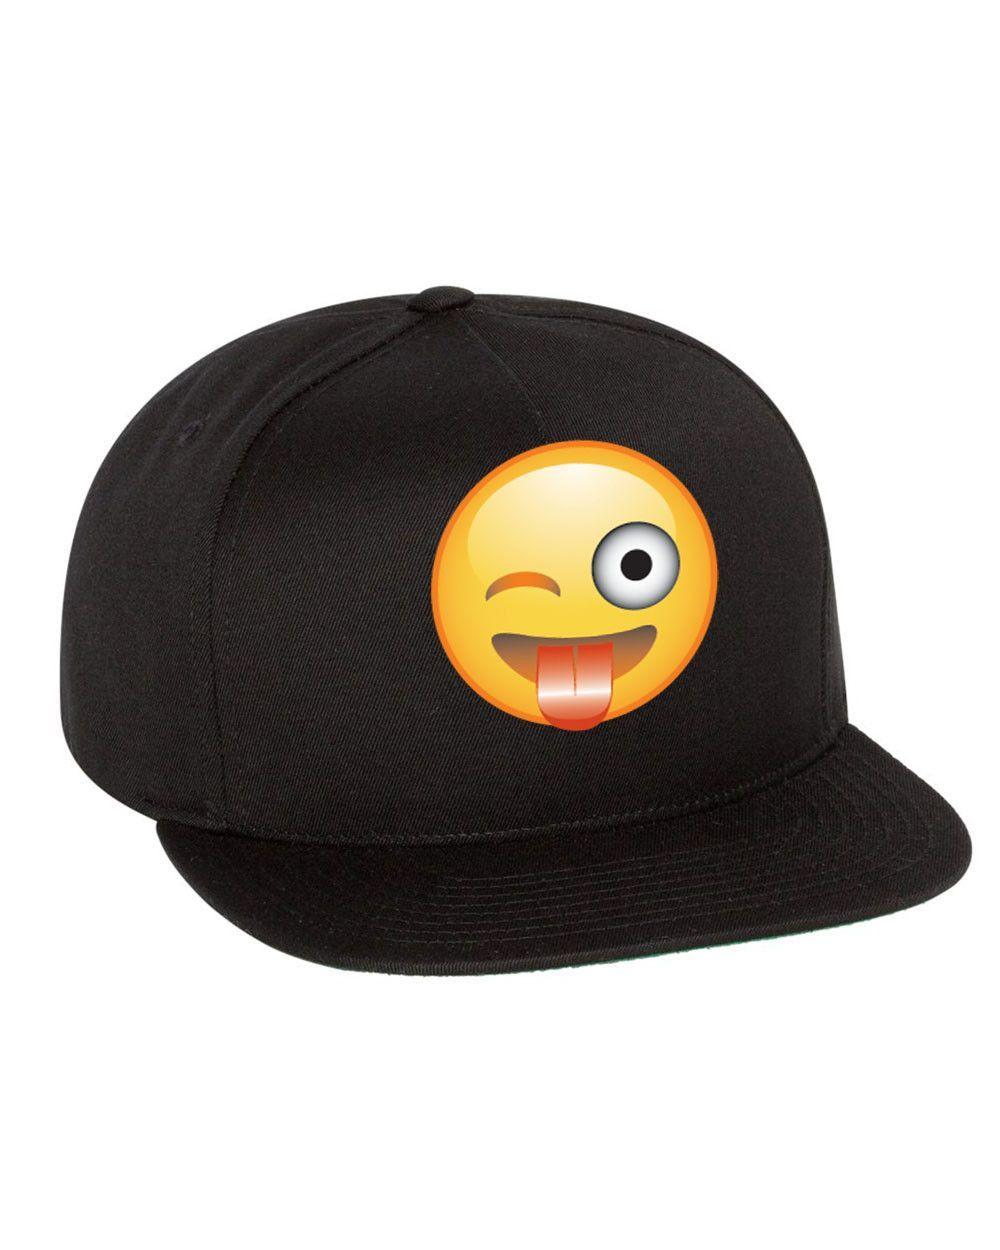 Emoji Winking Emoticon Single Color Flat Bill Cap Emoji Hat Flat Bill Cap Flat Bill Hats